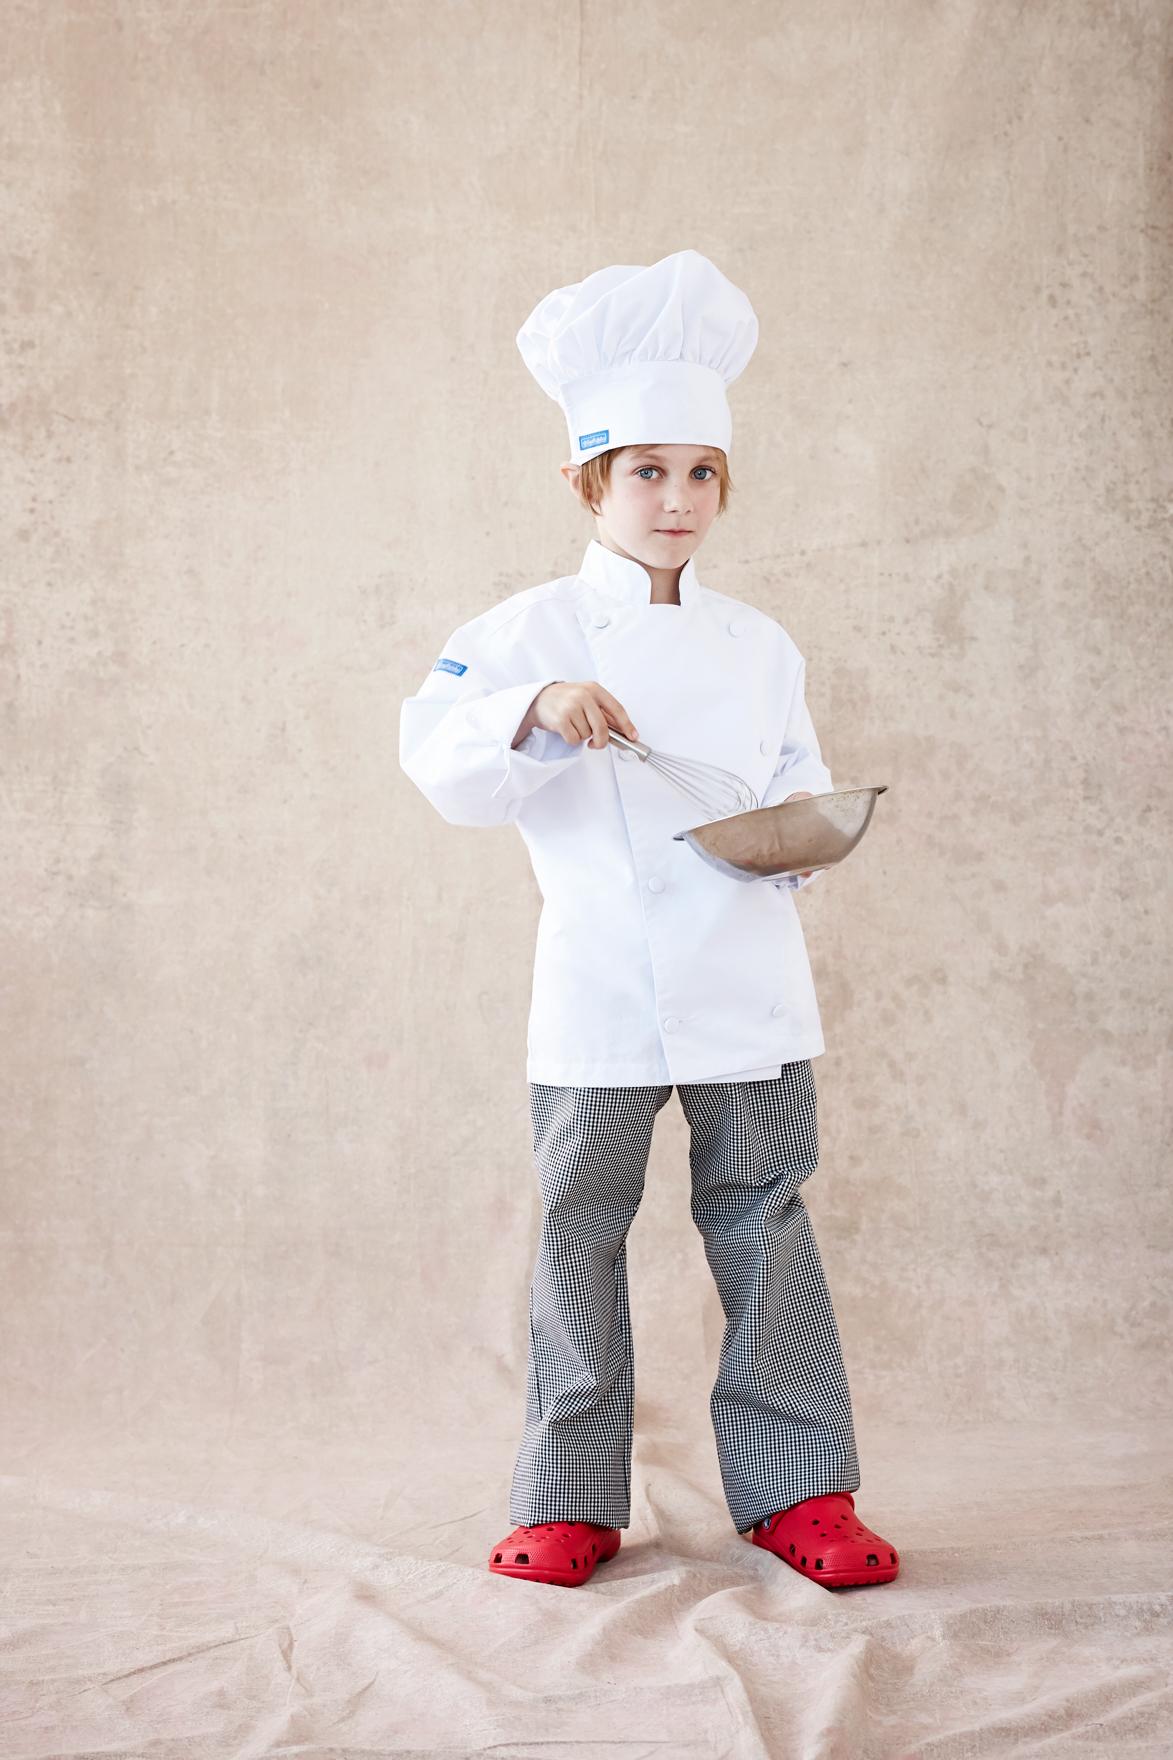 NoahI_Chef_dana_gallagher0124.jpg